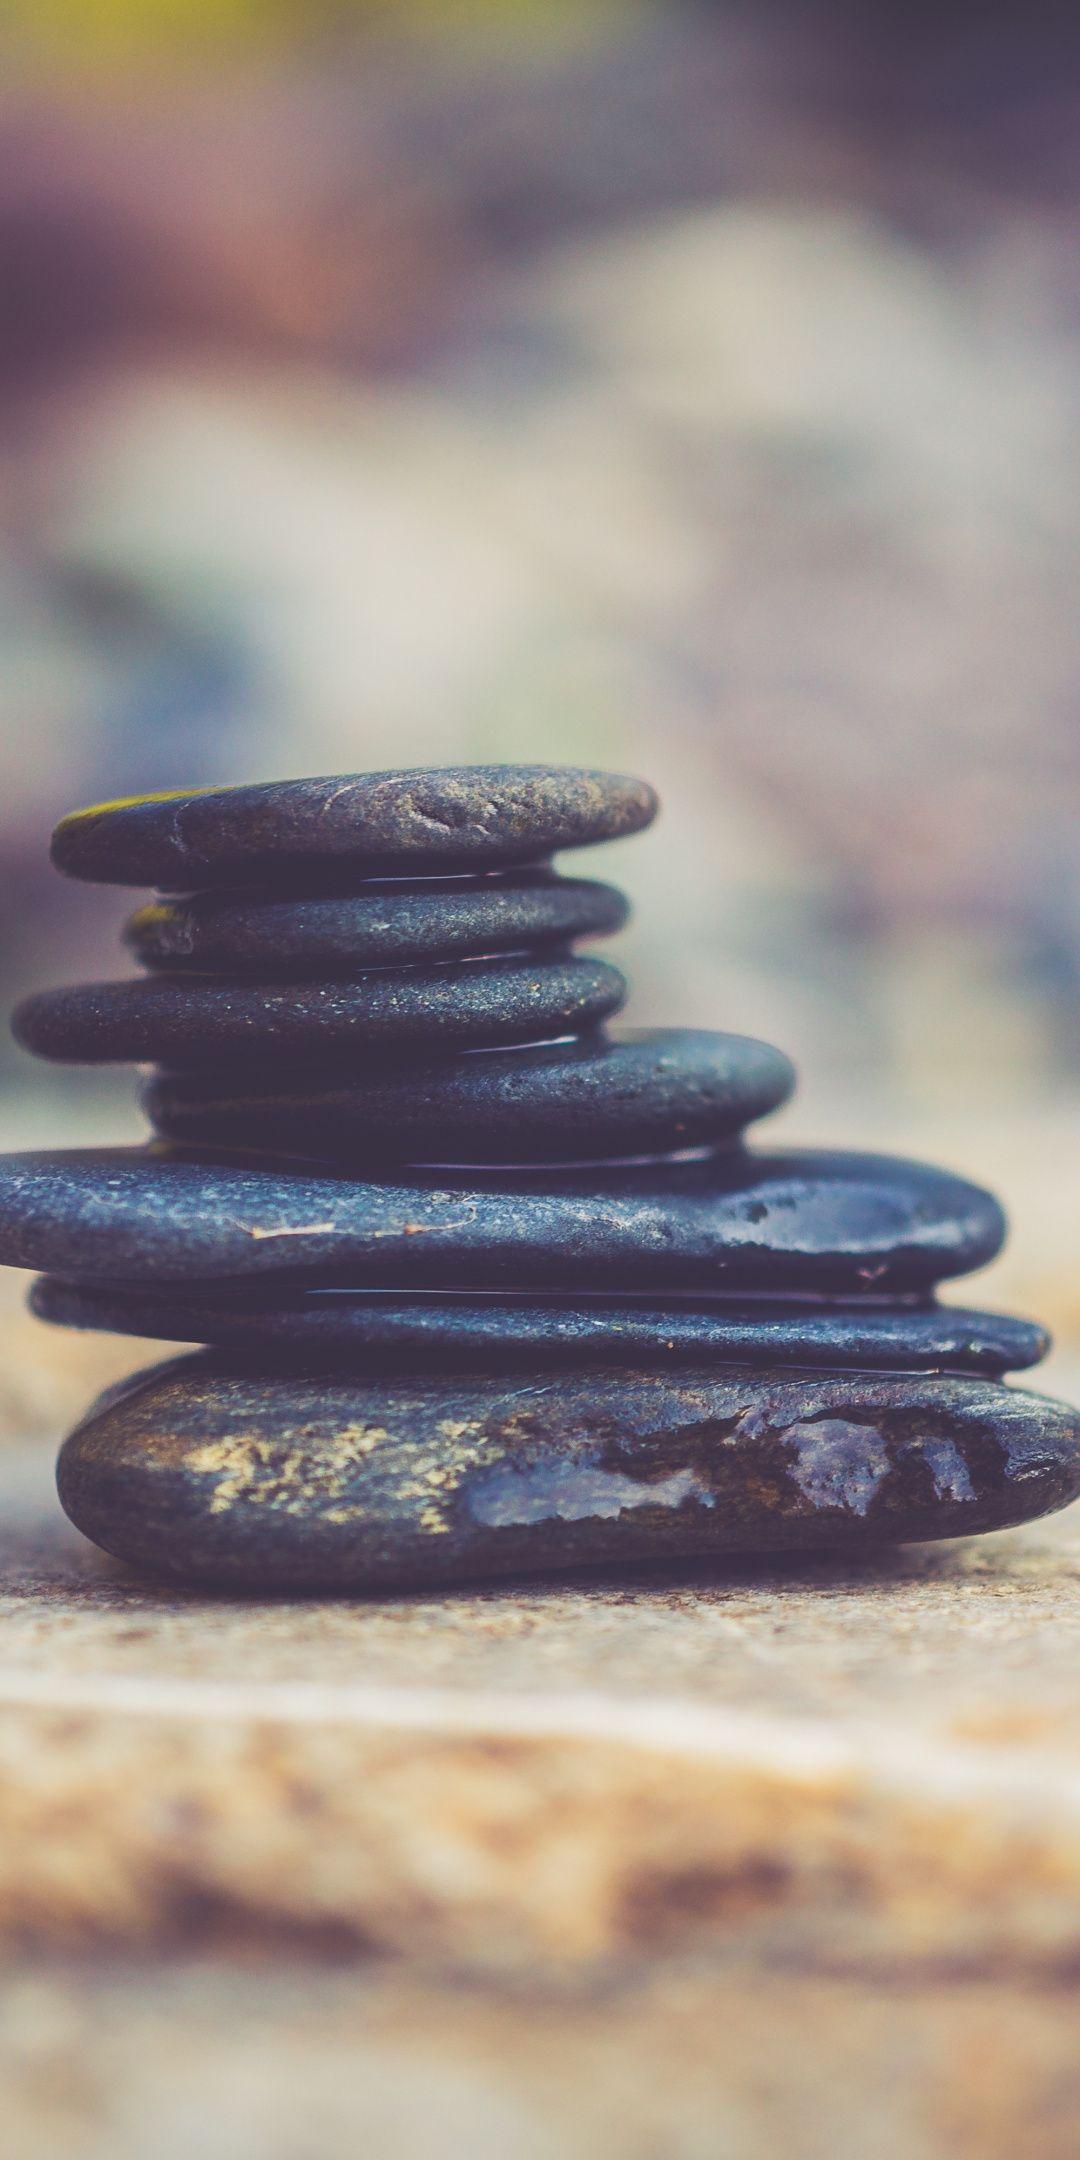 Zen Objects Balance Pebbles Rocks 1080x2160 Wallpaper Phone Backgrounds Wallpaper Zen